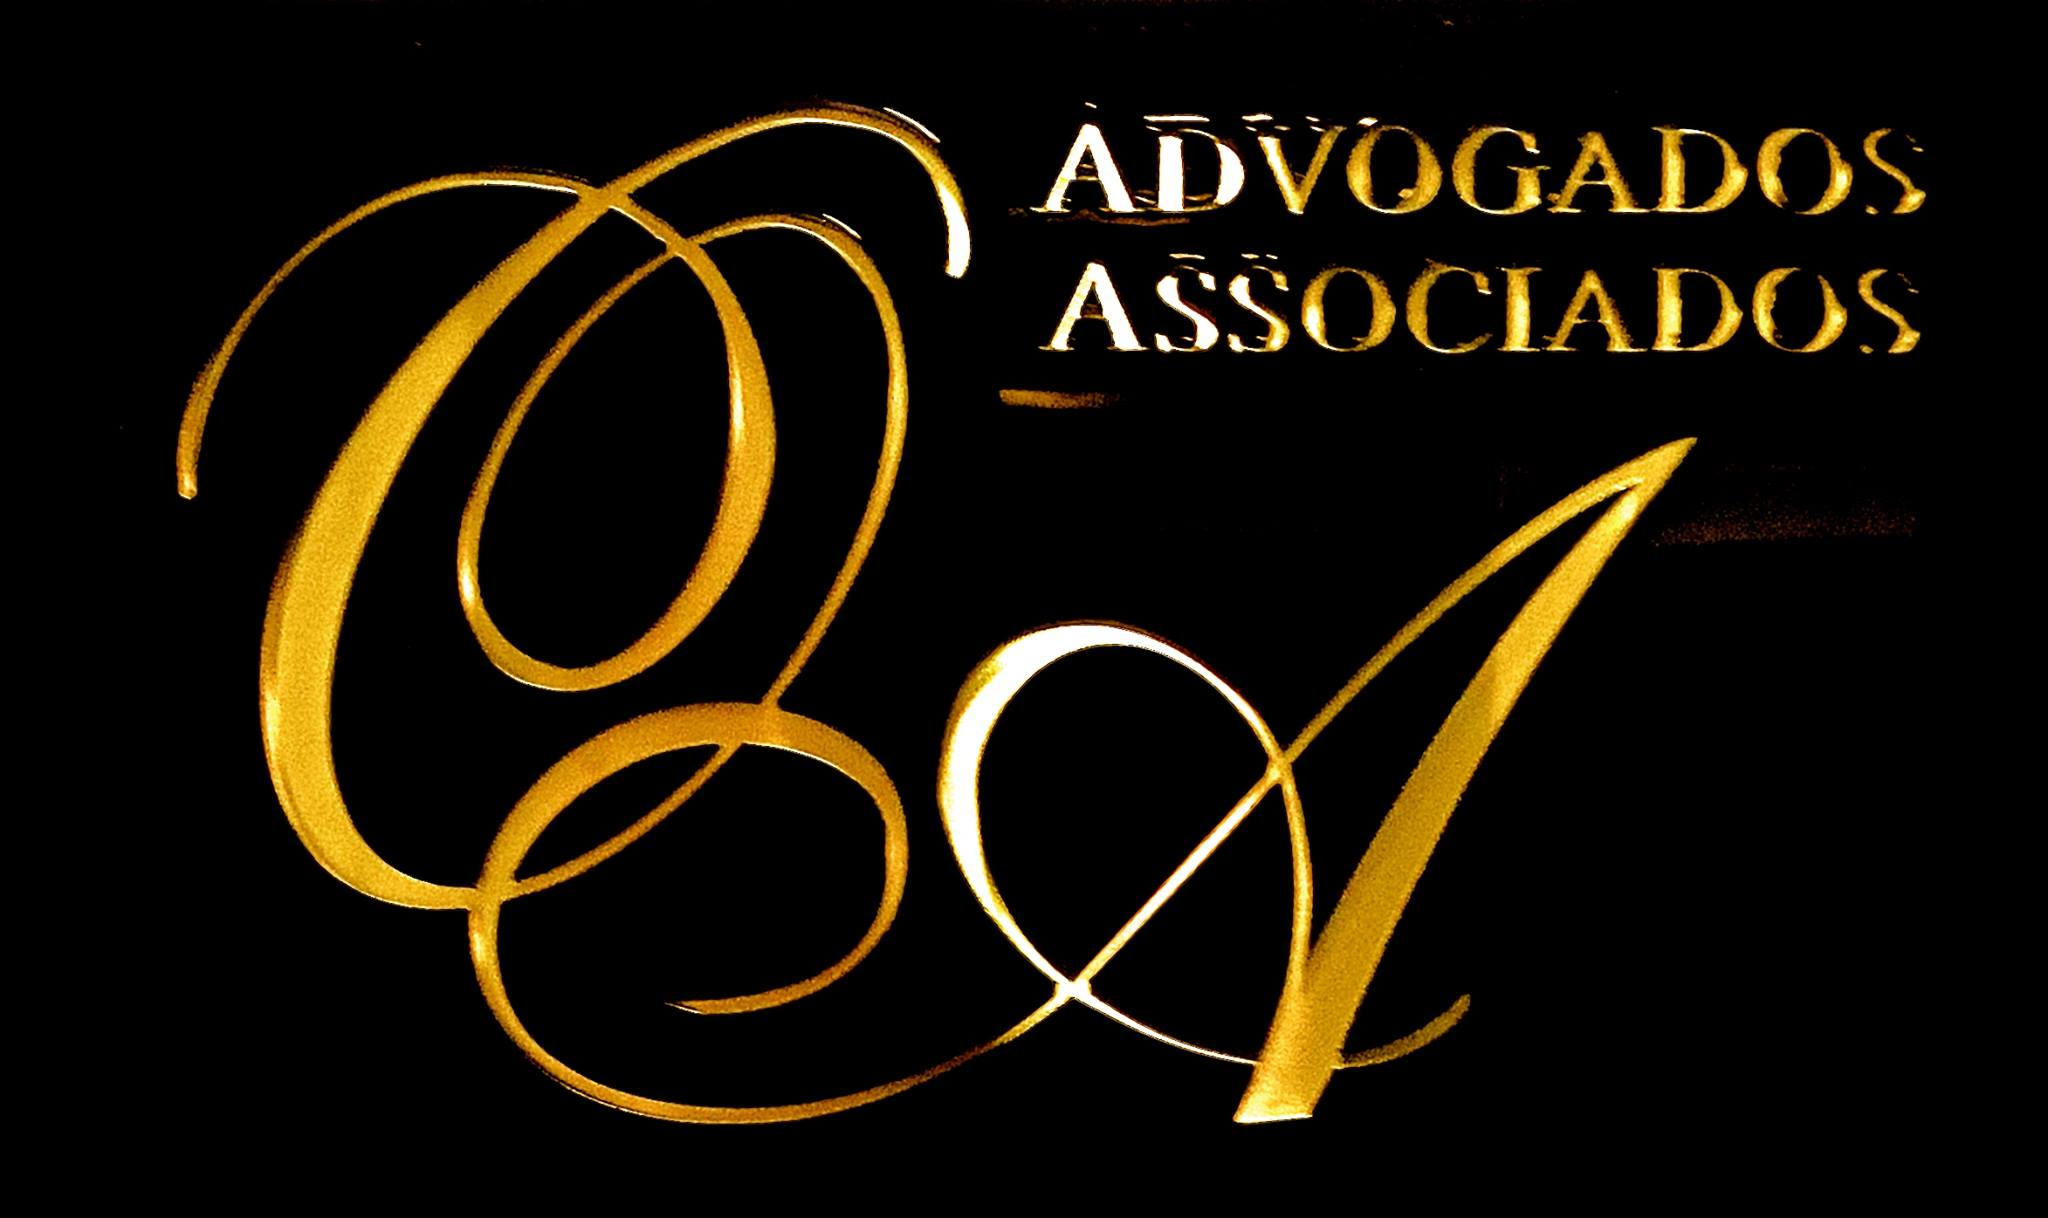 Oscar Azevedo Advogados Associados